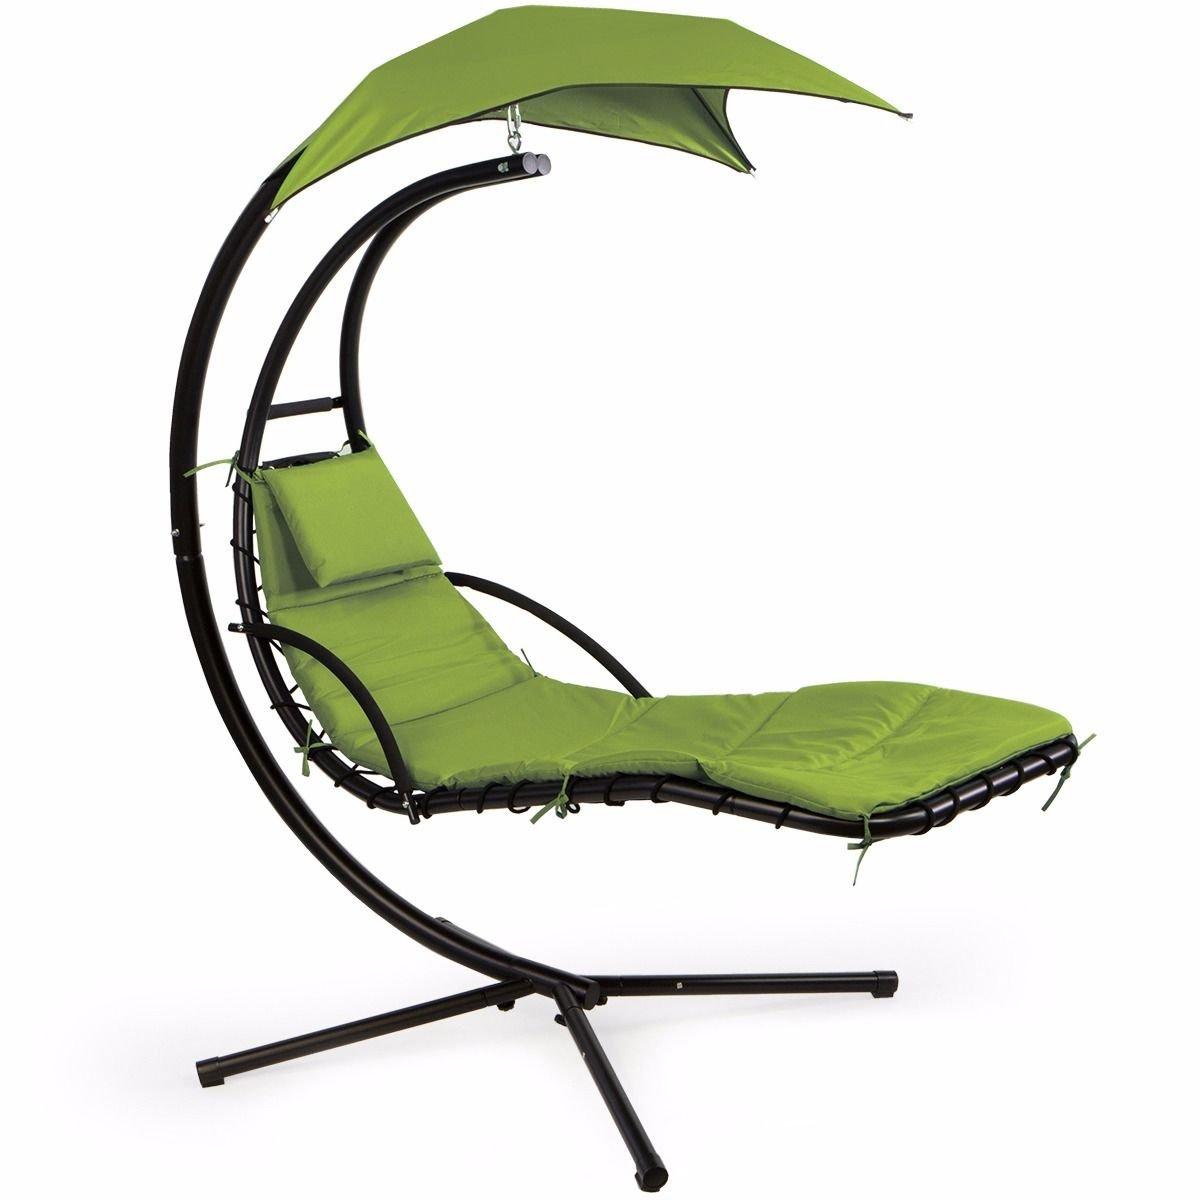 XtremepowerUS Floating Swing Chaise Lounge Chair Hammock Lounger Patio Lounge Seat Backyard w/Cushion- Green